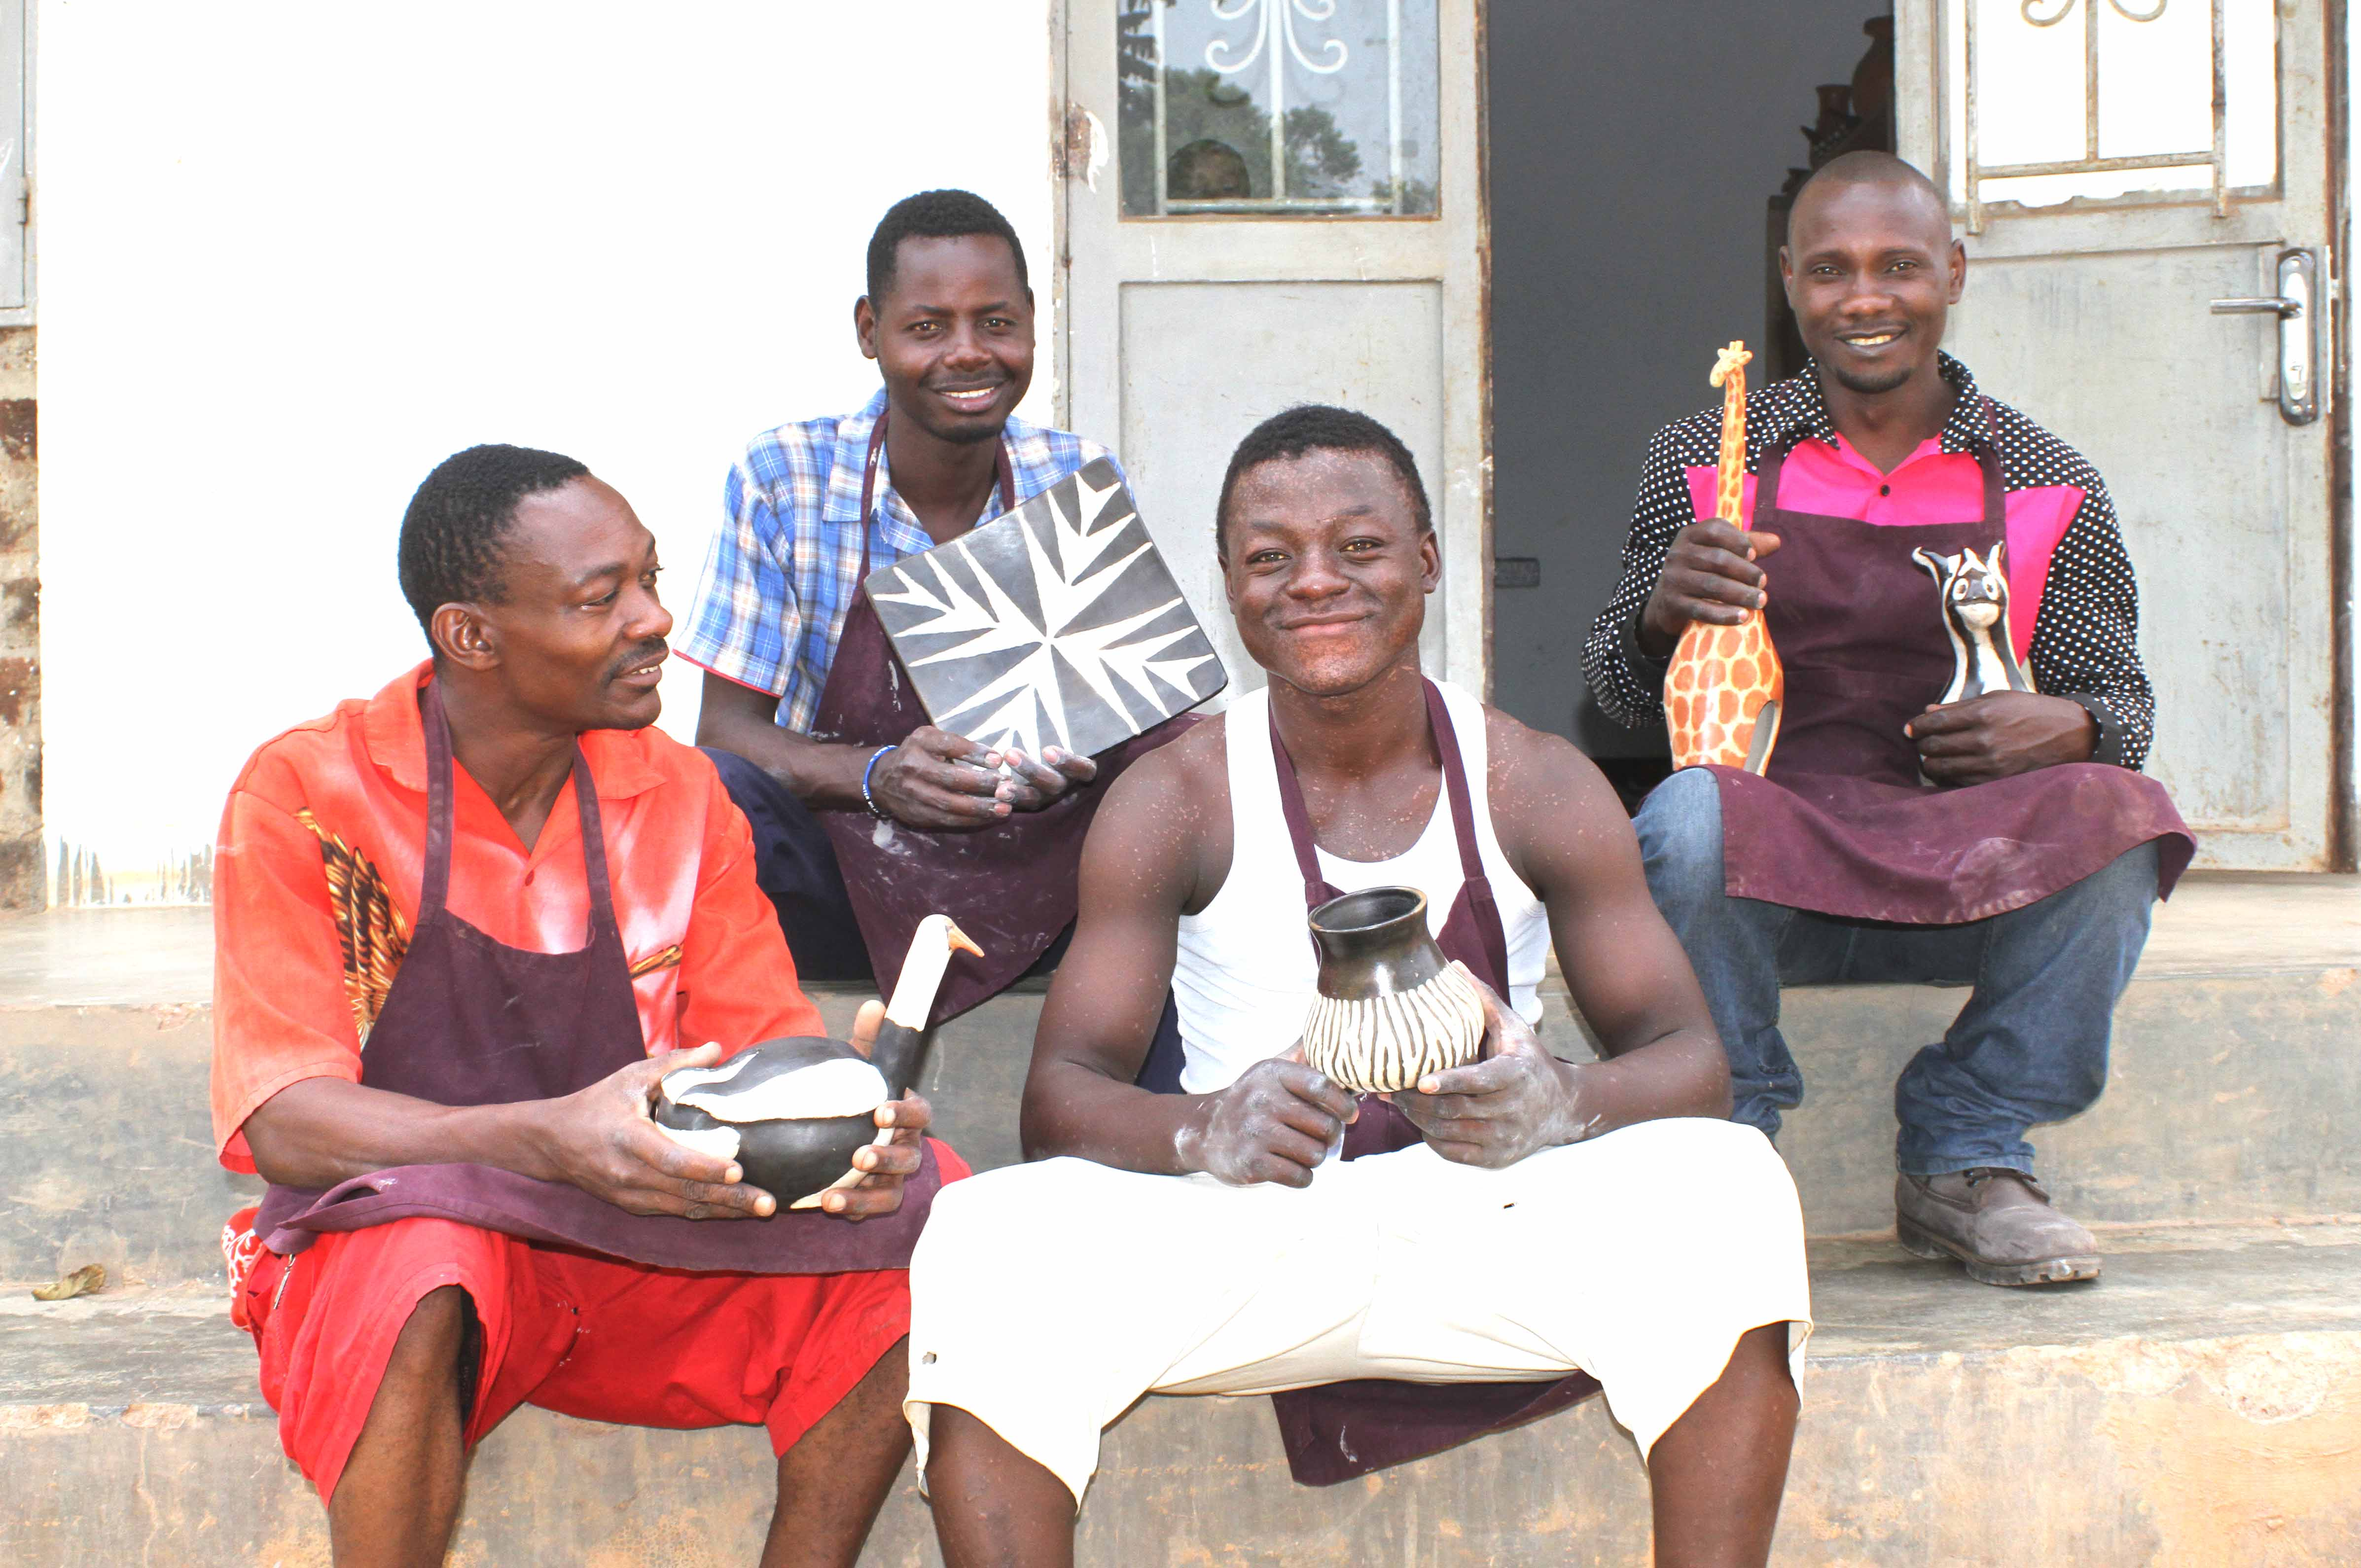 /srv/www/vhosts/user3101/html/entrepreneurship-campus.org/wp-content/uploads/2016/06/Mukono-Potters.jpg